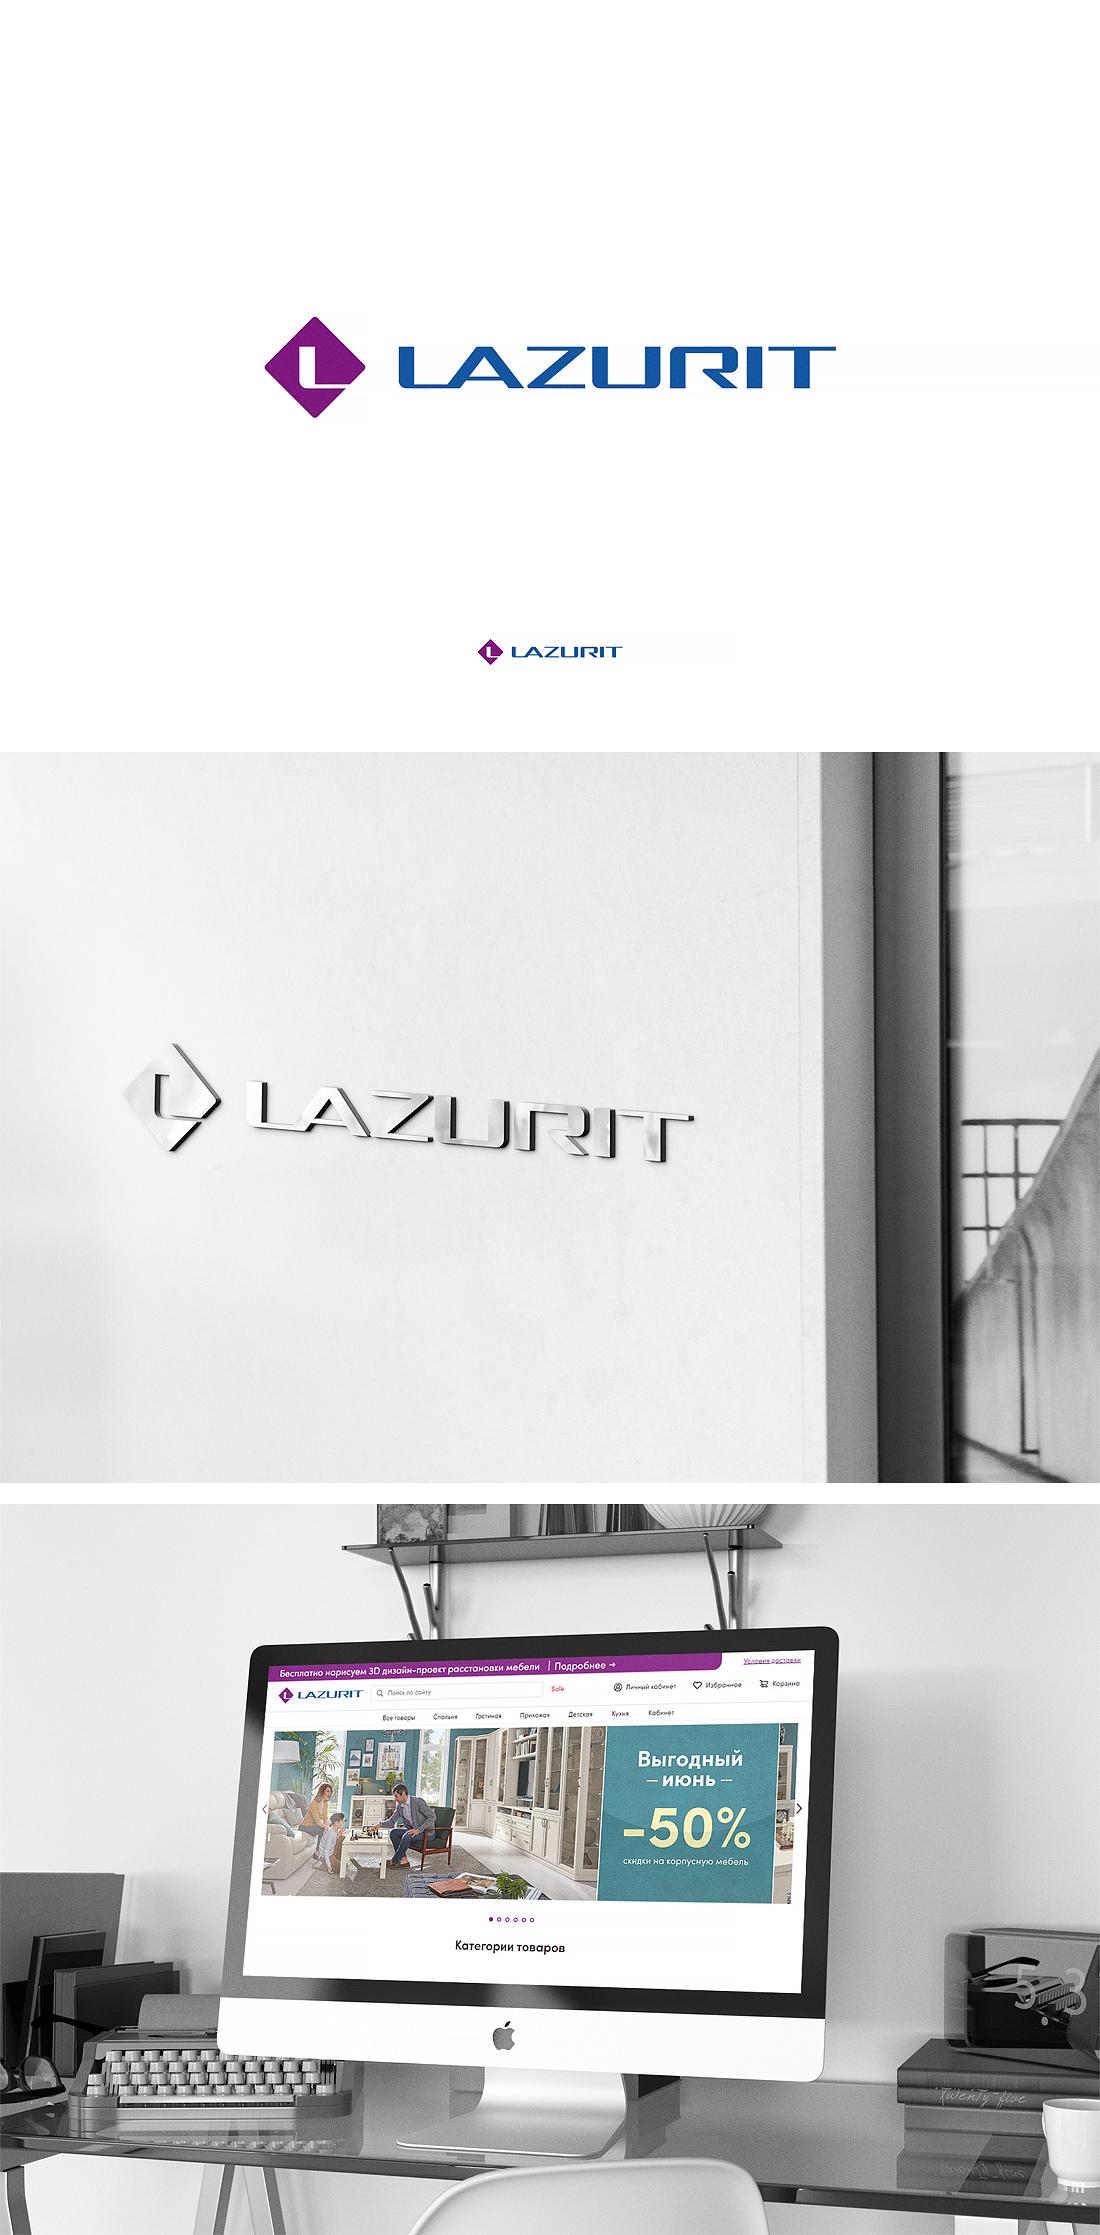 Рестайлинг логотипа компании. фото f_6195efb7112a3bdd.jpg